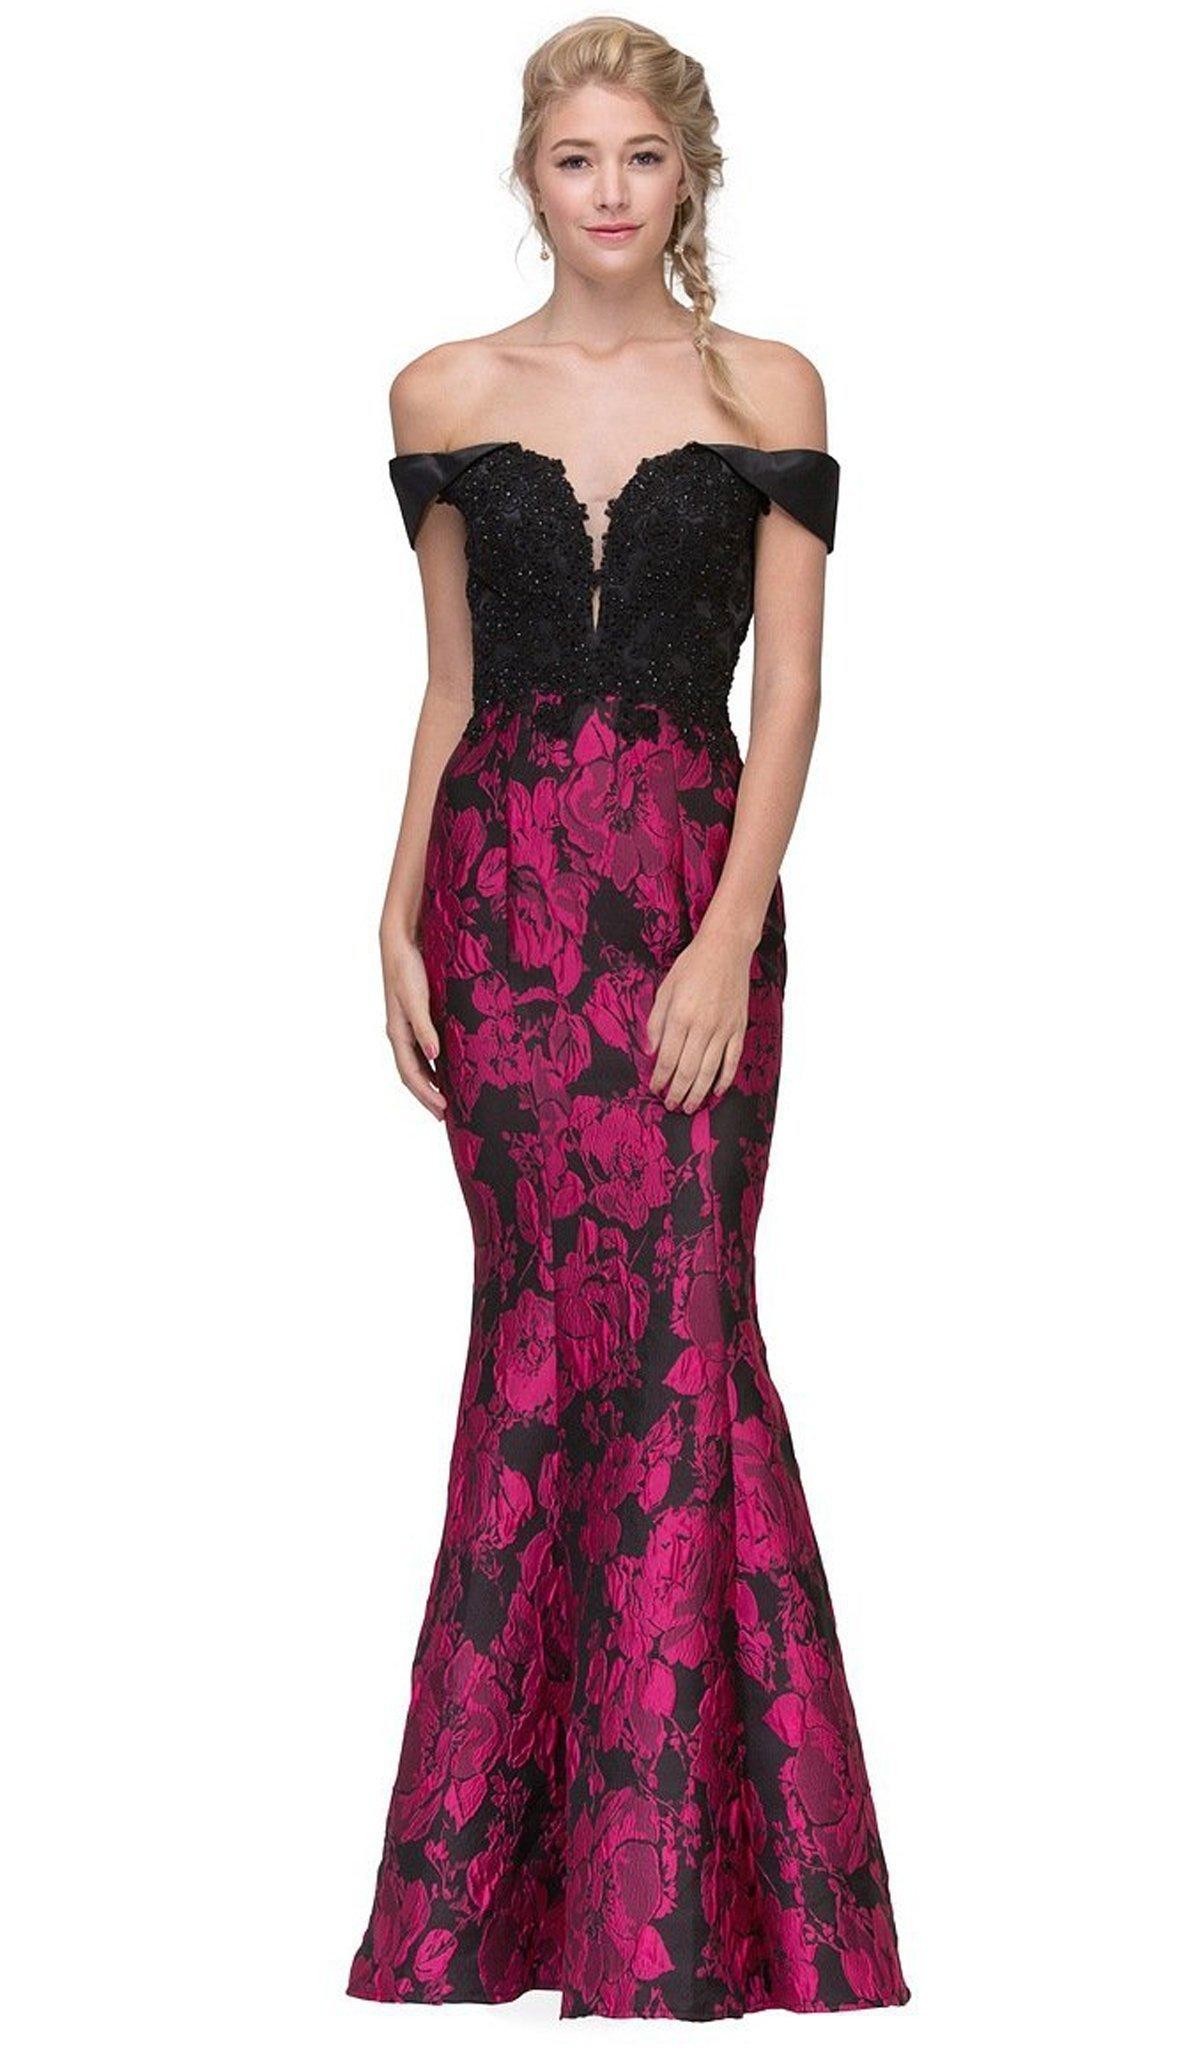 Eureka Fashion - Lace Off-Shoulder Floral Print Mermaid Dress